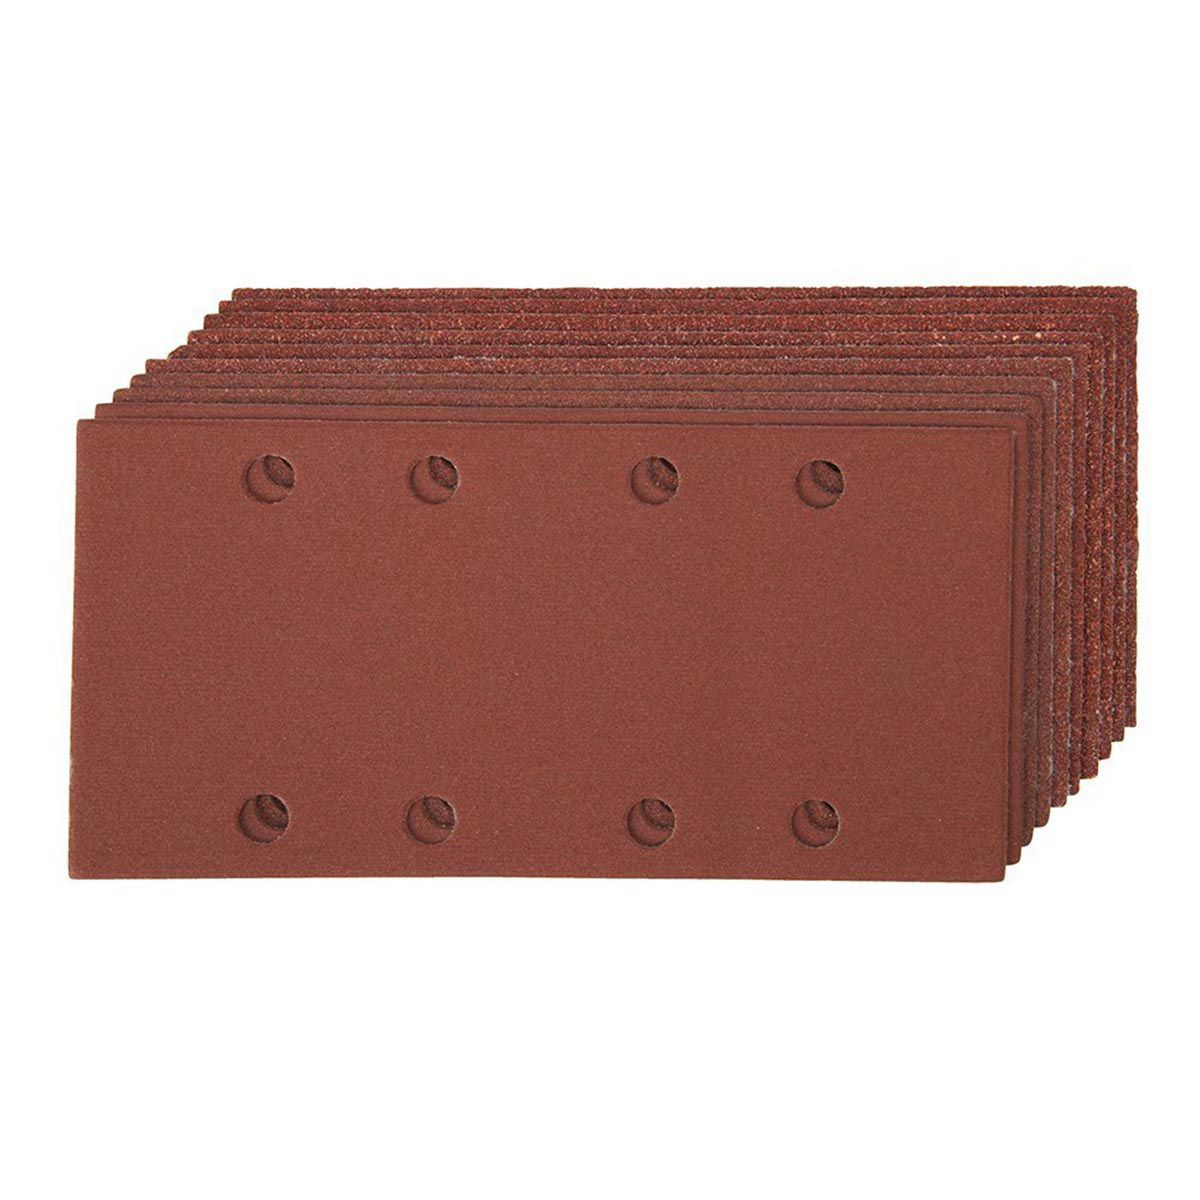 93x186mm 20 Pack Hook/Loop 1/3 Sheet Sanding Sander Sandpaper Pads Mixed Grit 40 120 8-hole Square Sandpaper Drop Shopping